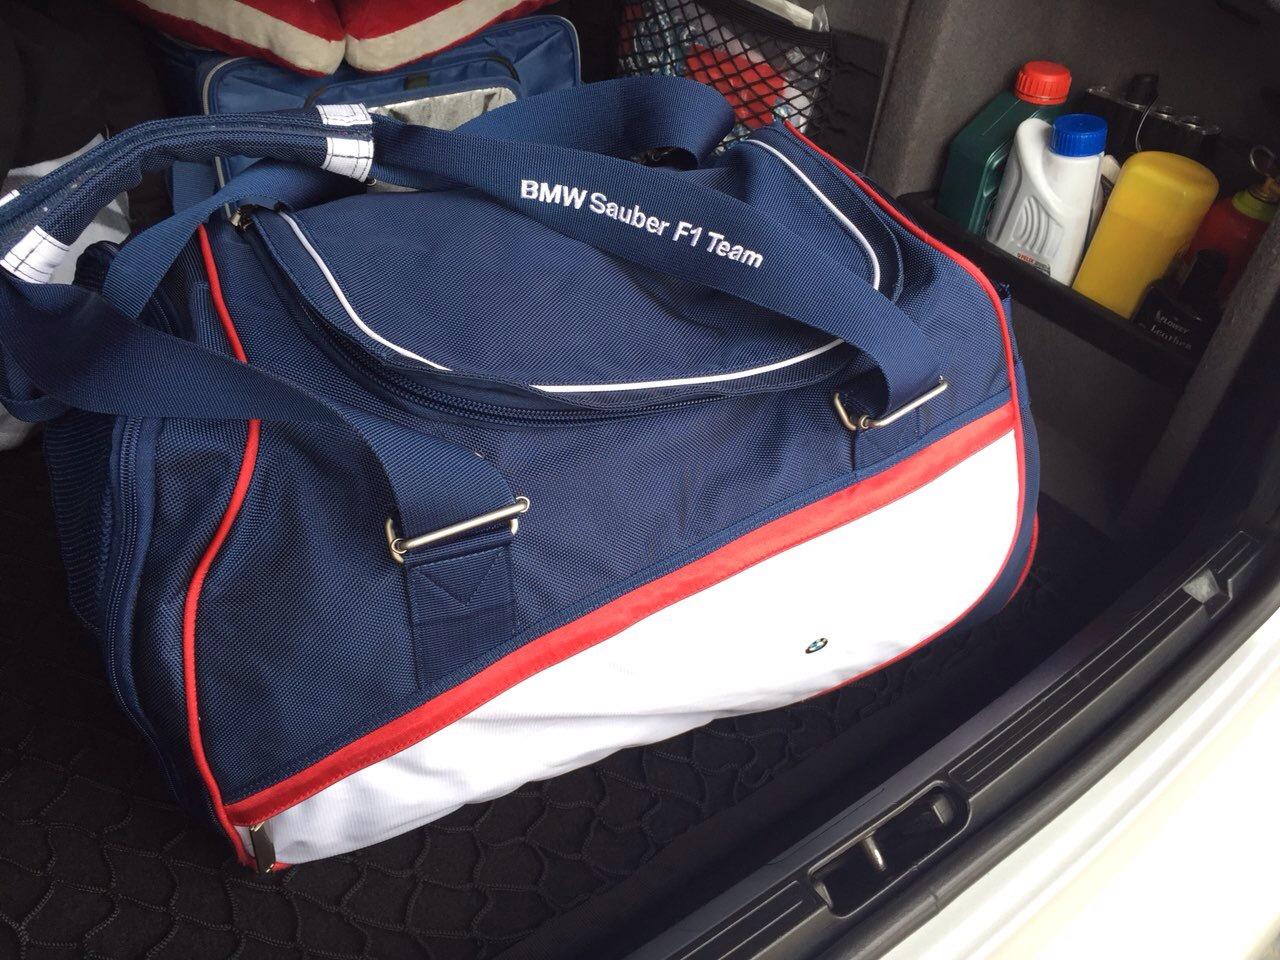 a4353c75a4e5 спортивная сумка bmw sauber F1 Team — BMW 5 series, 2.5 л., 2001 ...